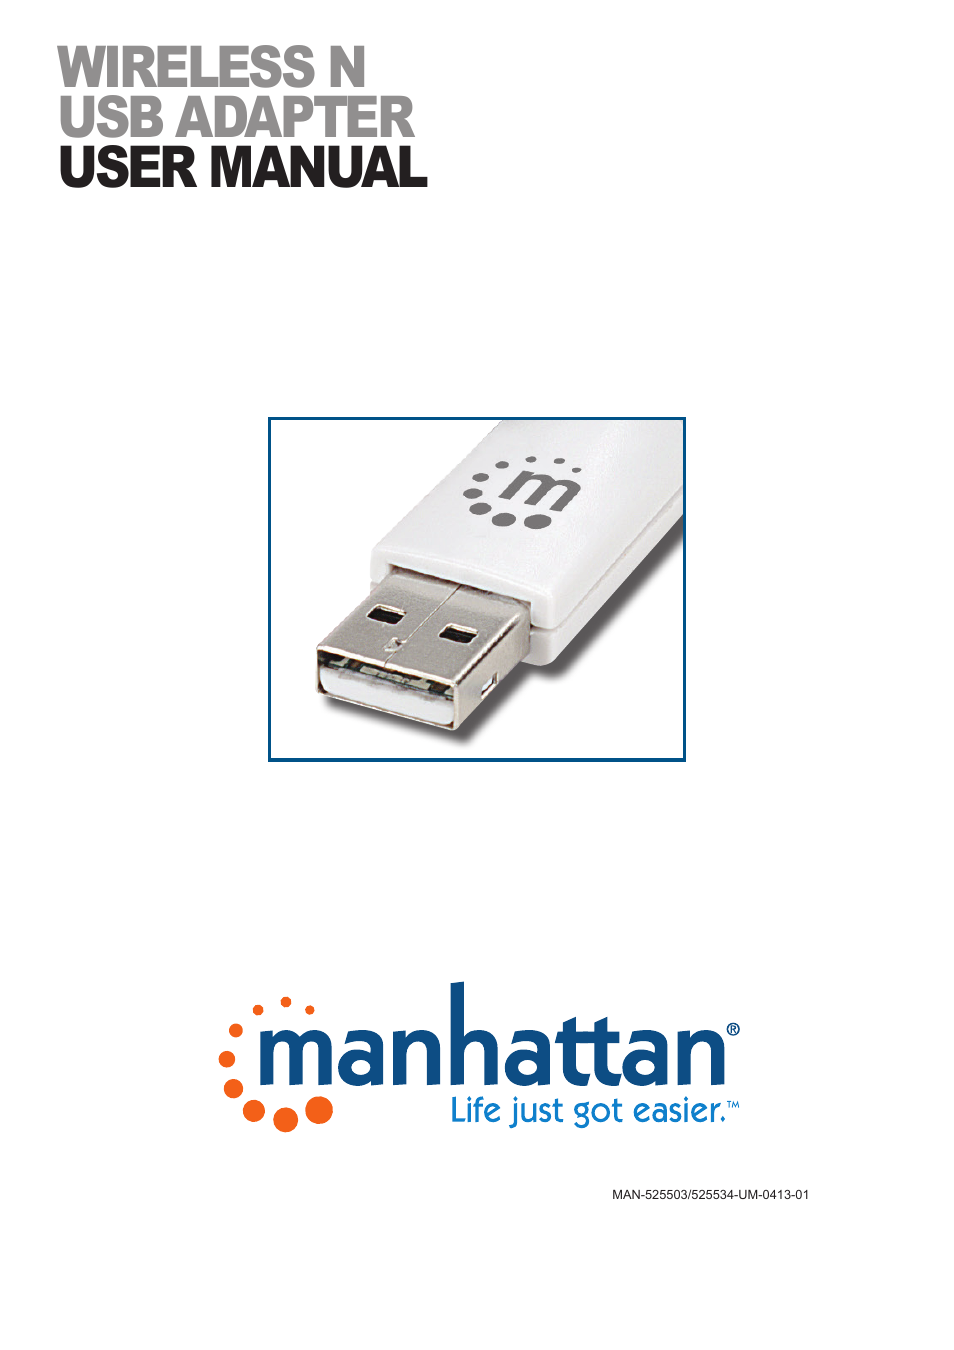 525503 Manhattan USB Adapter